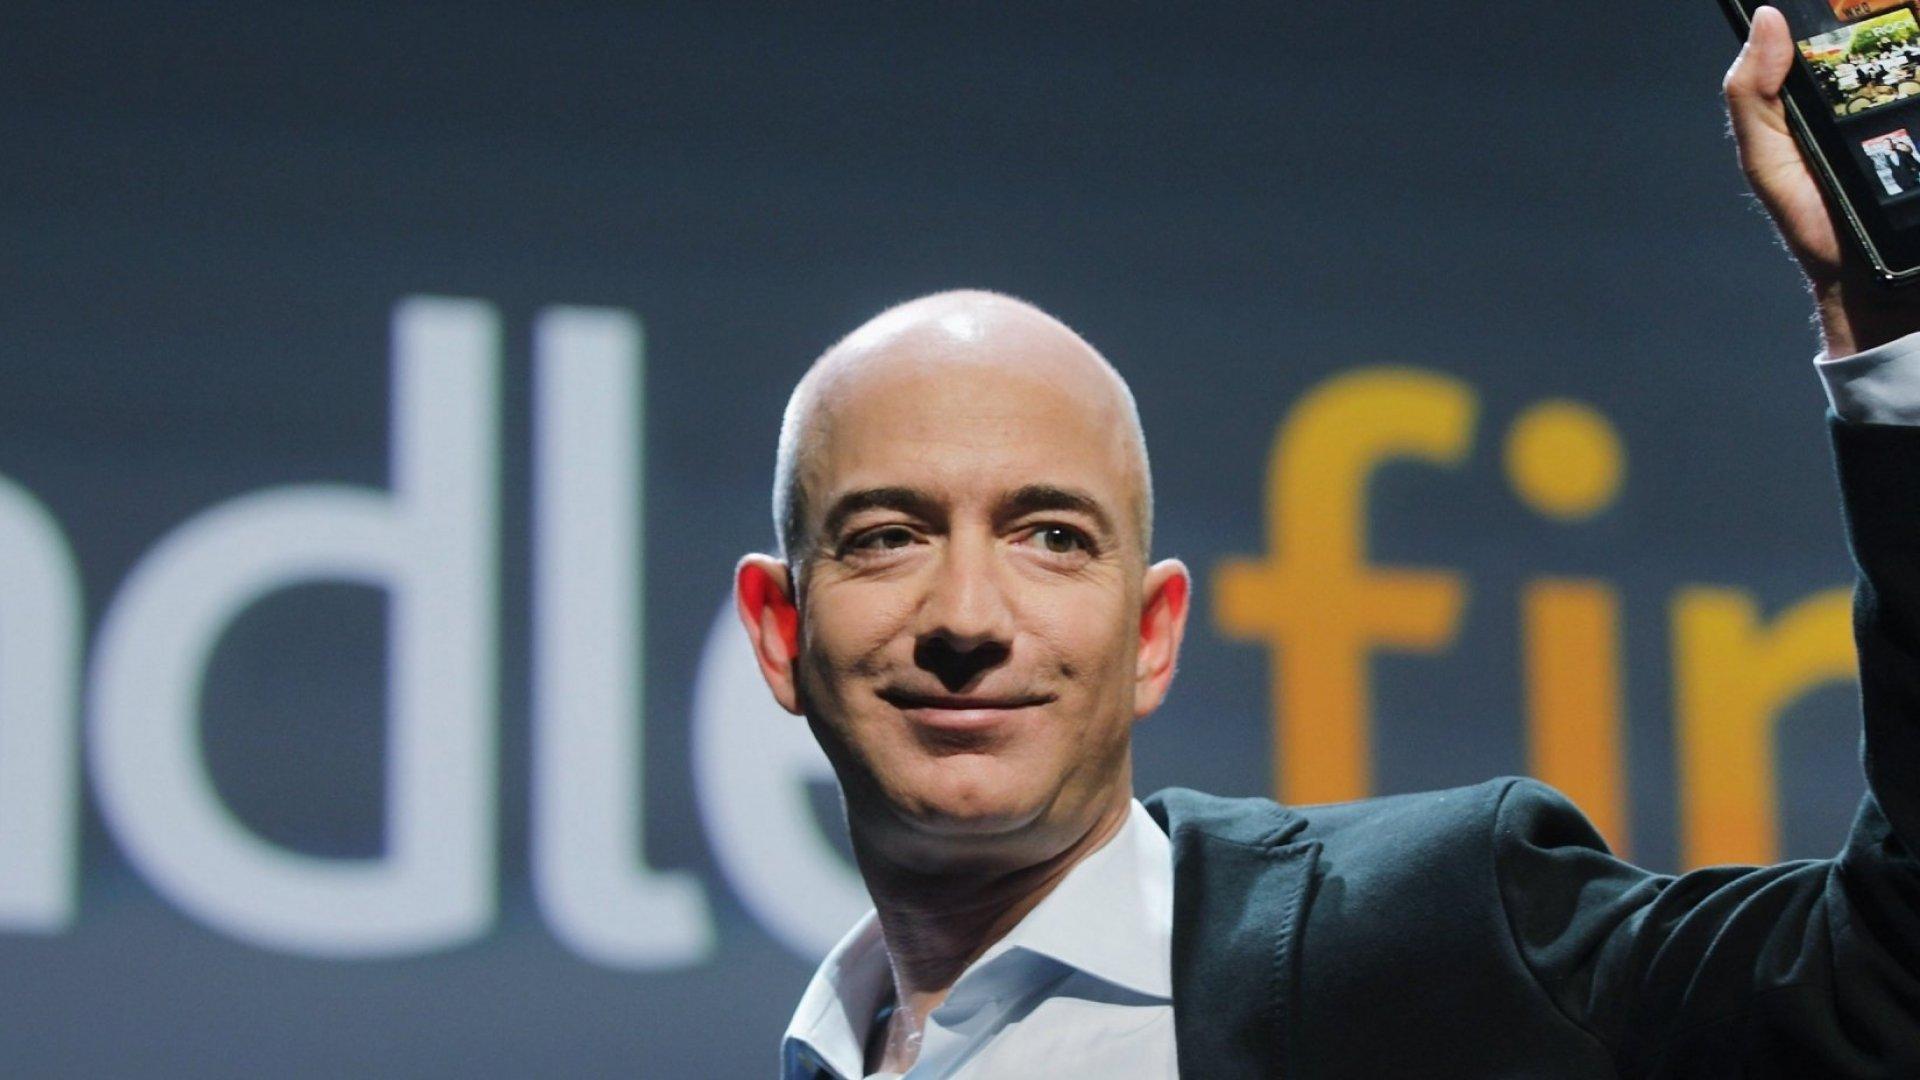 Amazon's Quarterly Earnings Continue to Rise Towards $1 Billion Mark